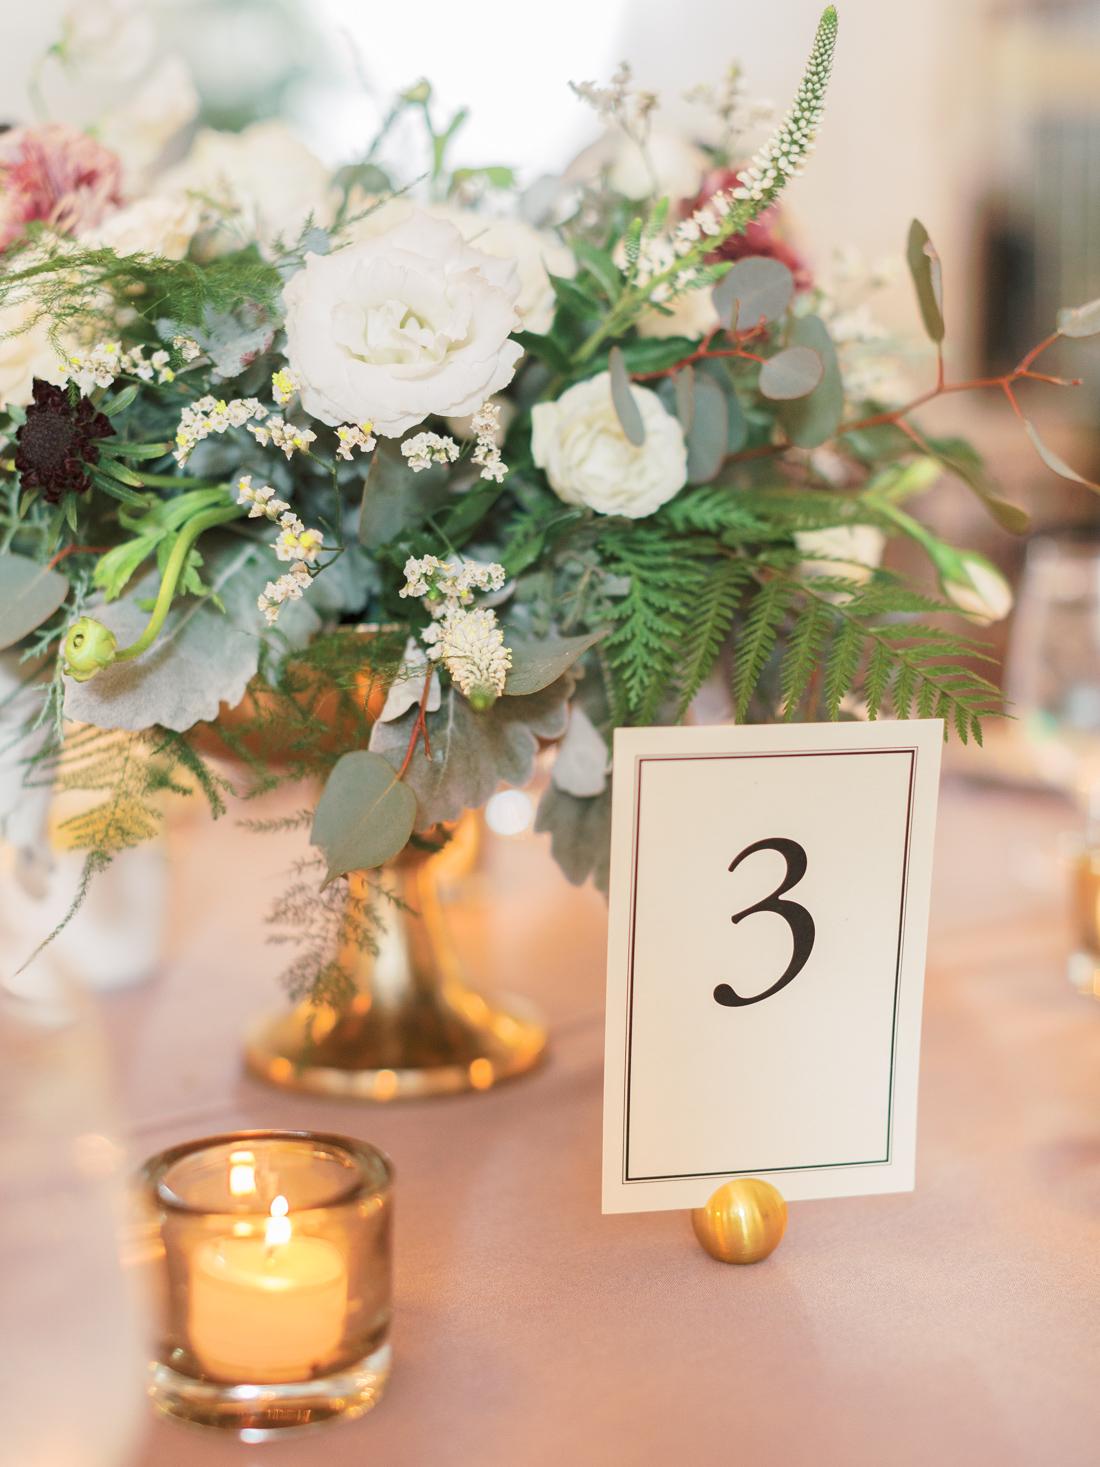 crimson-and-clover-floral-wedding-reception-centerpieces